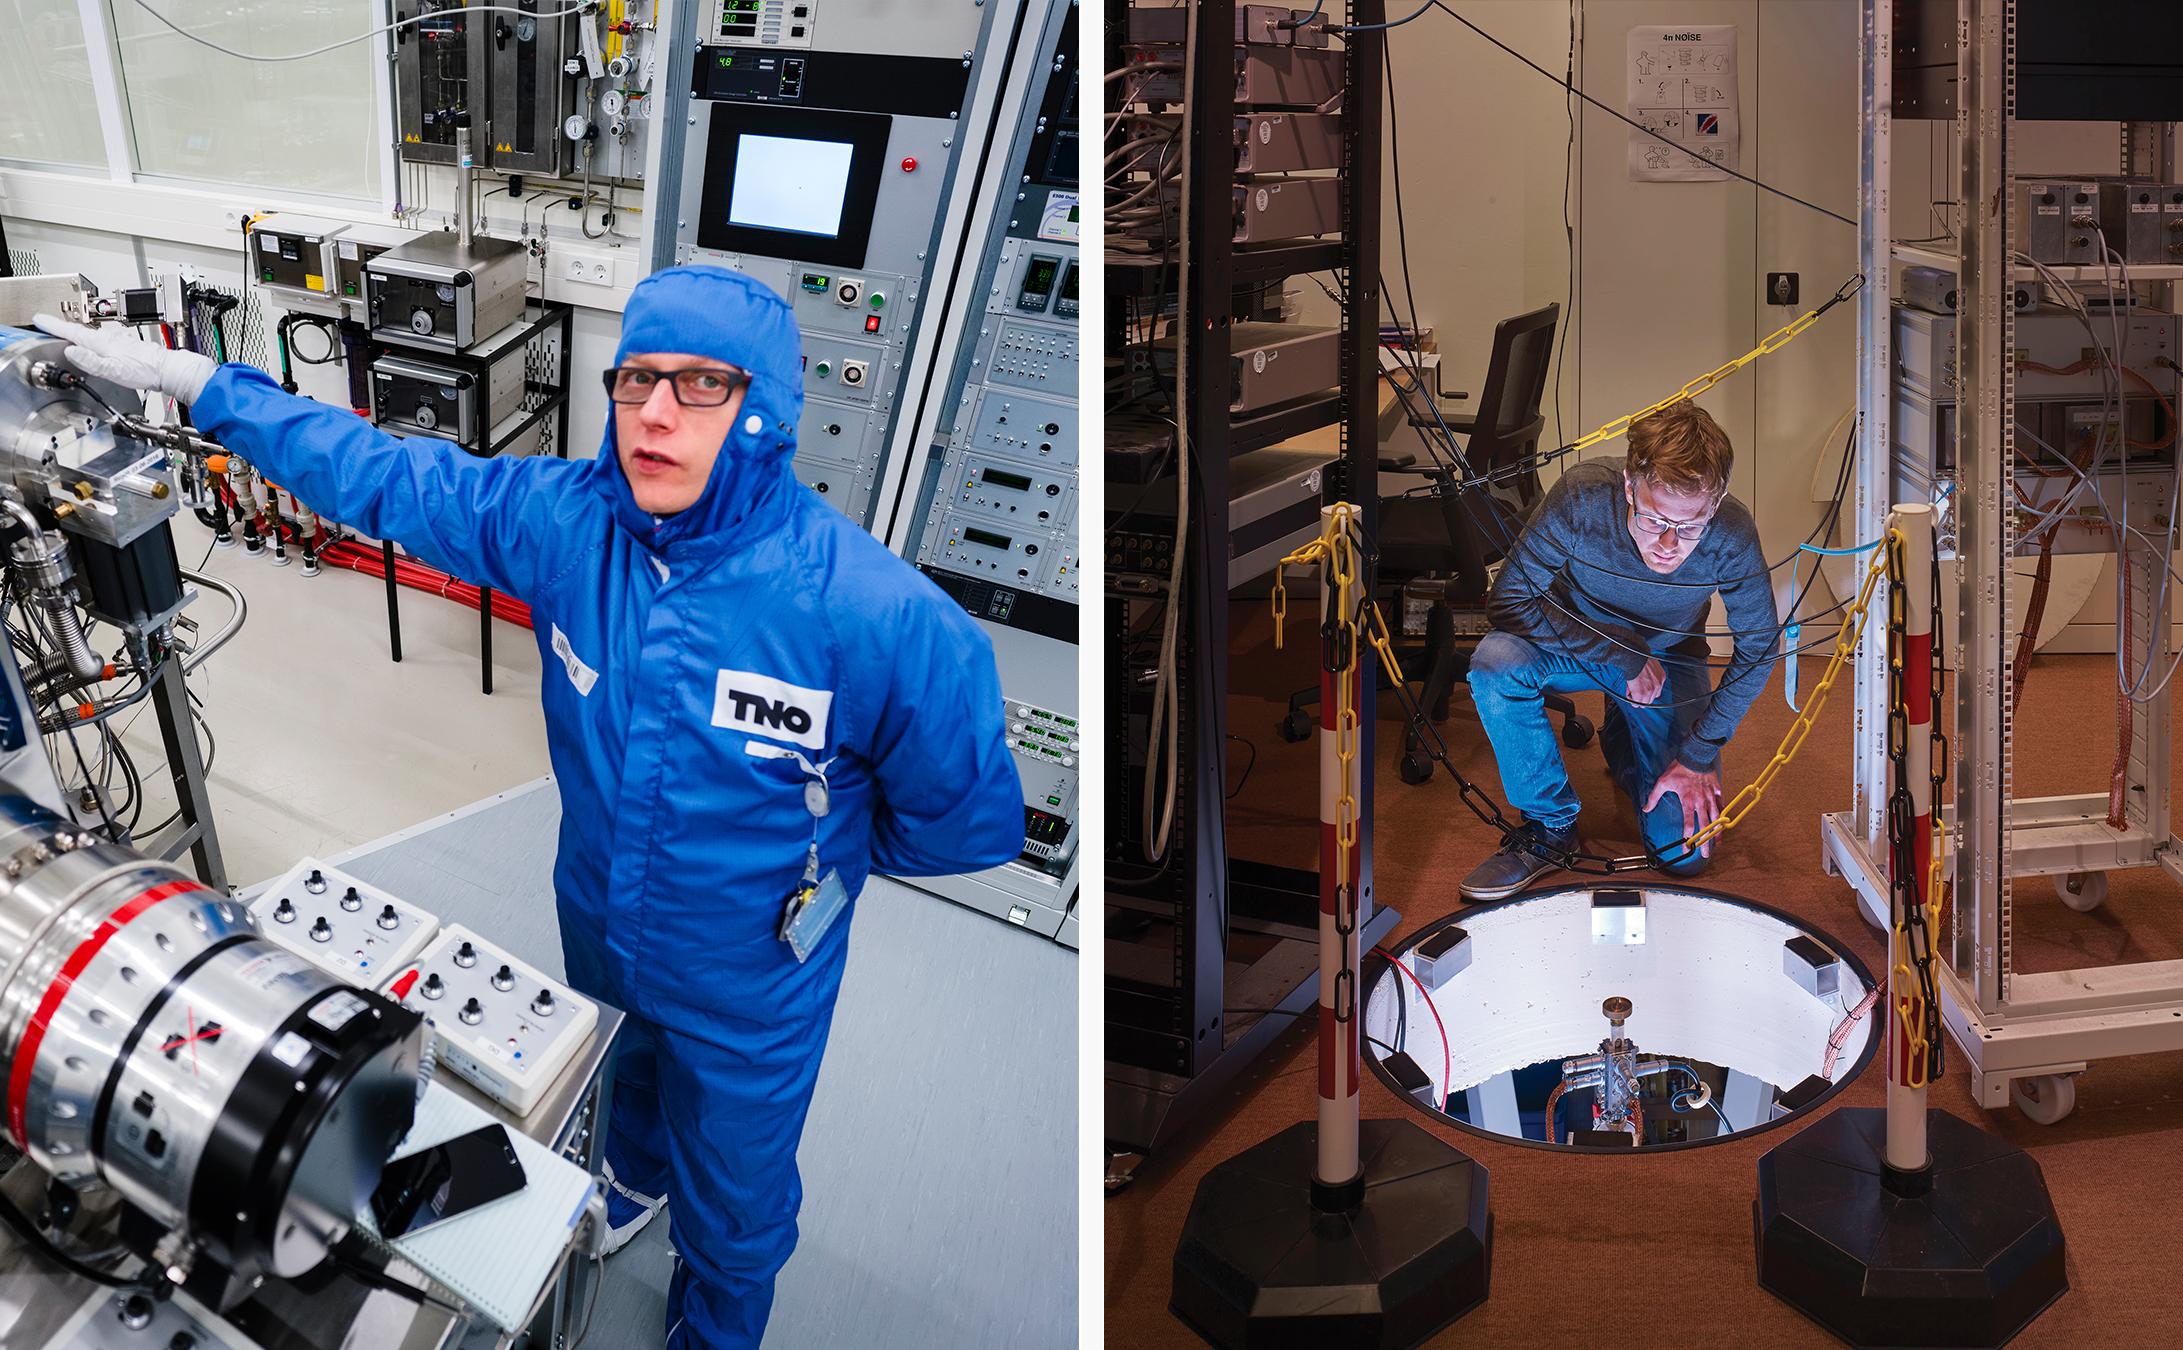 "<b><a href=""https://www.technologyreview.com/s/603495/10-breakthrough-technologies-2017-practical-quantum-computers/"" target=""_blank"">Practical Quantum Computers</a></b> <br> Photographs by Mathijs Labadie and Russ Juskalian"